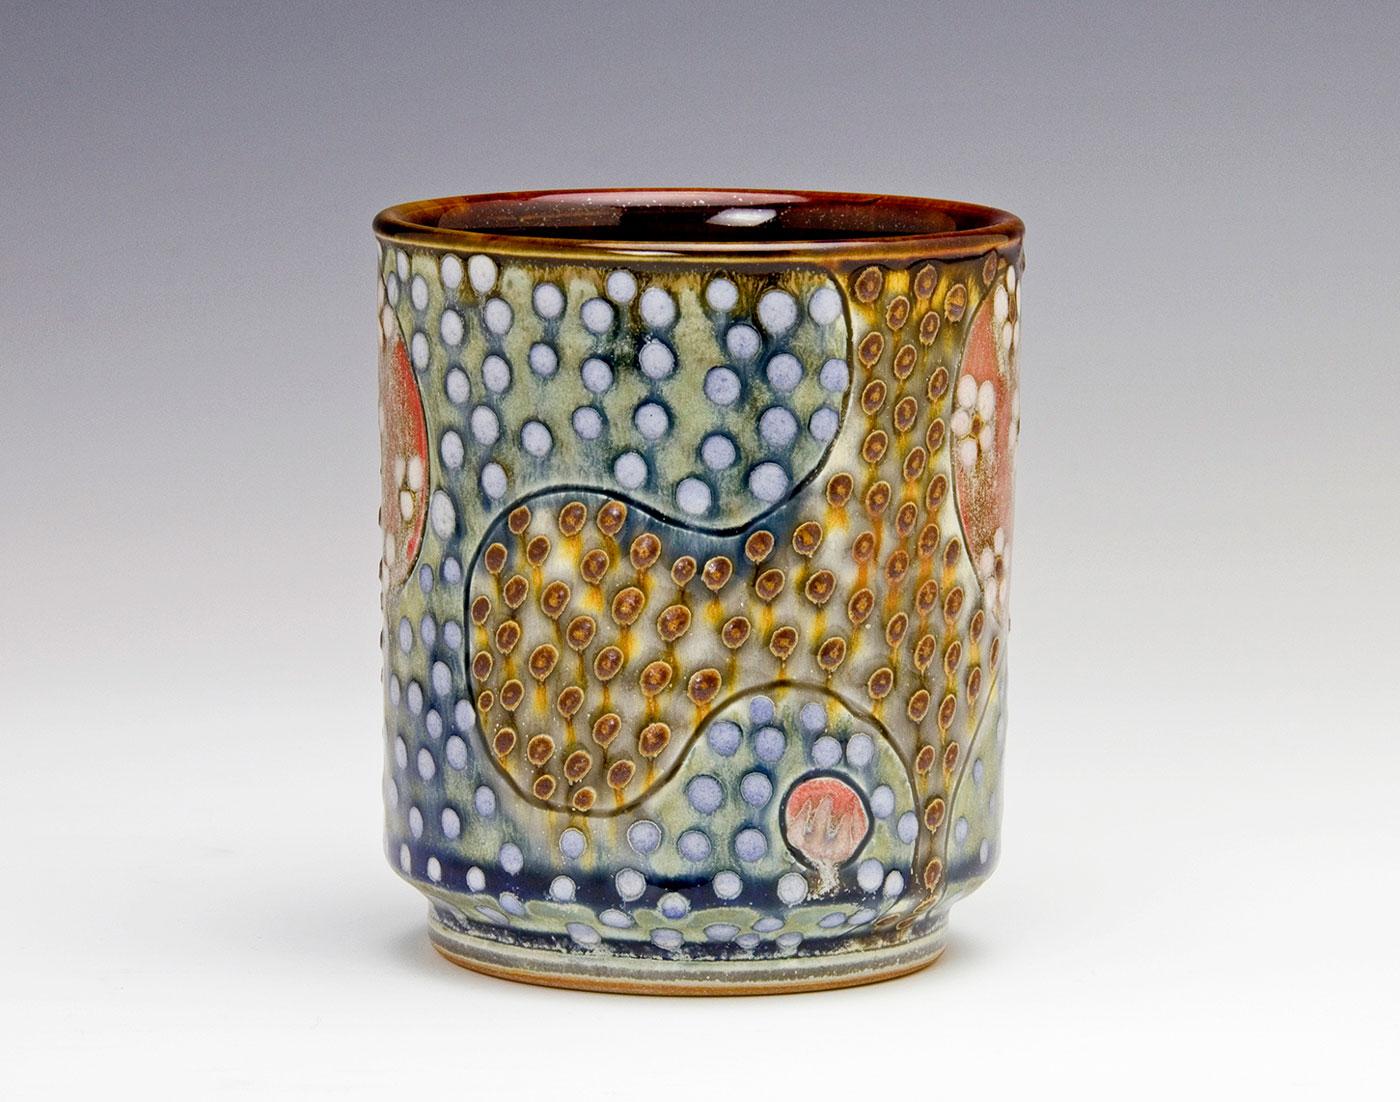 Pattern-Medley-studio-Art-cup-Samantha-Henneke-Bulldog-Pottery-Seagrove.jpg